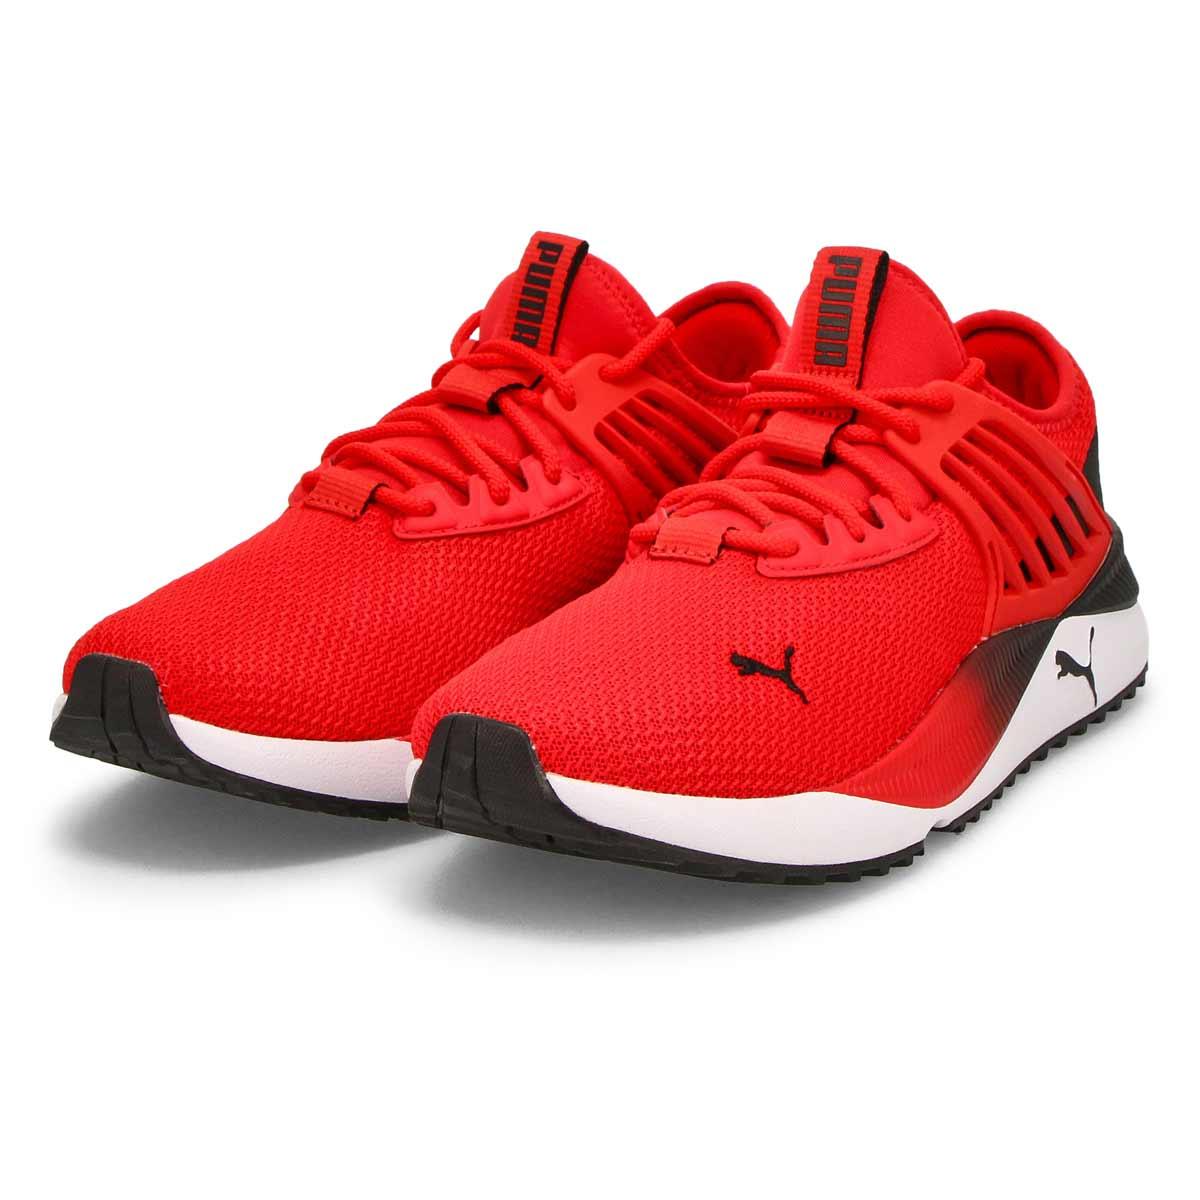 Men's Pacer Future Classic Sneaker - Red/Black